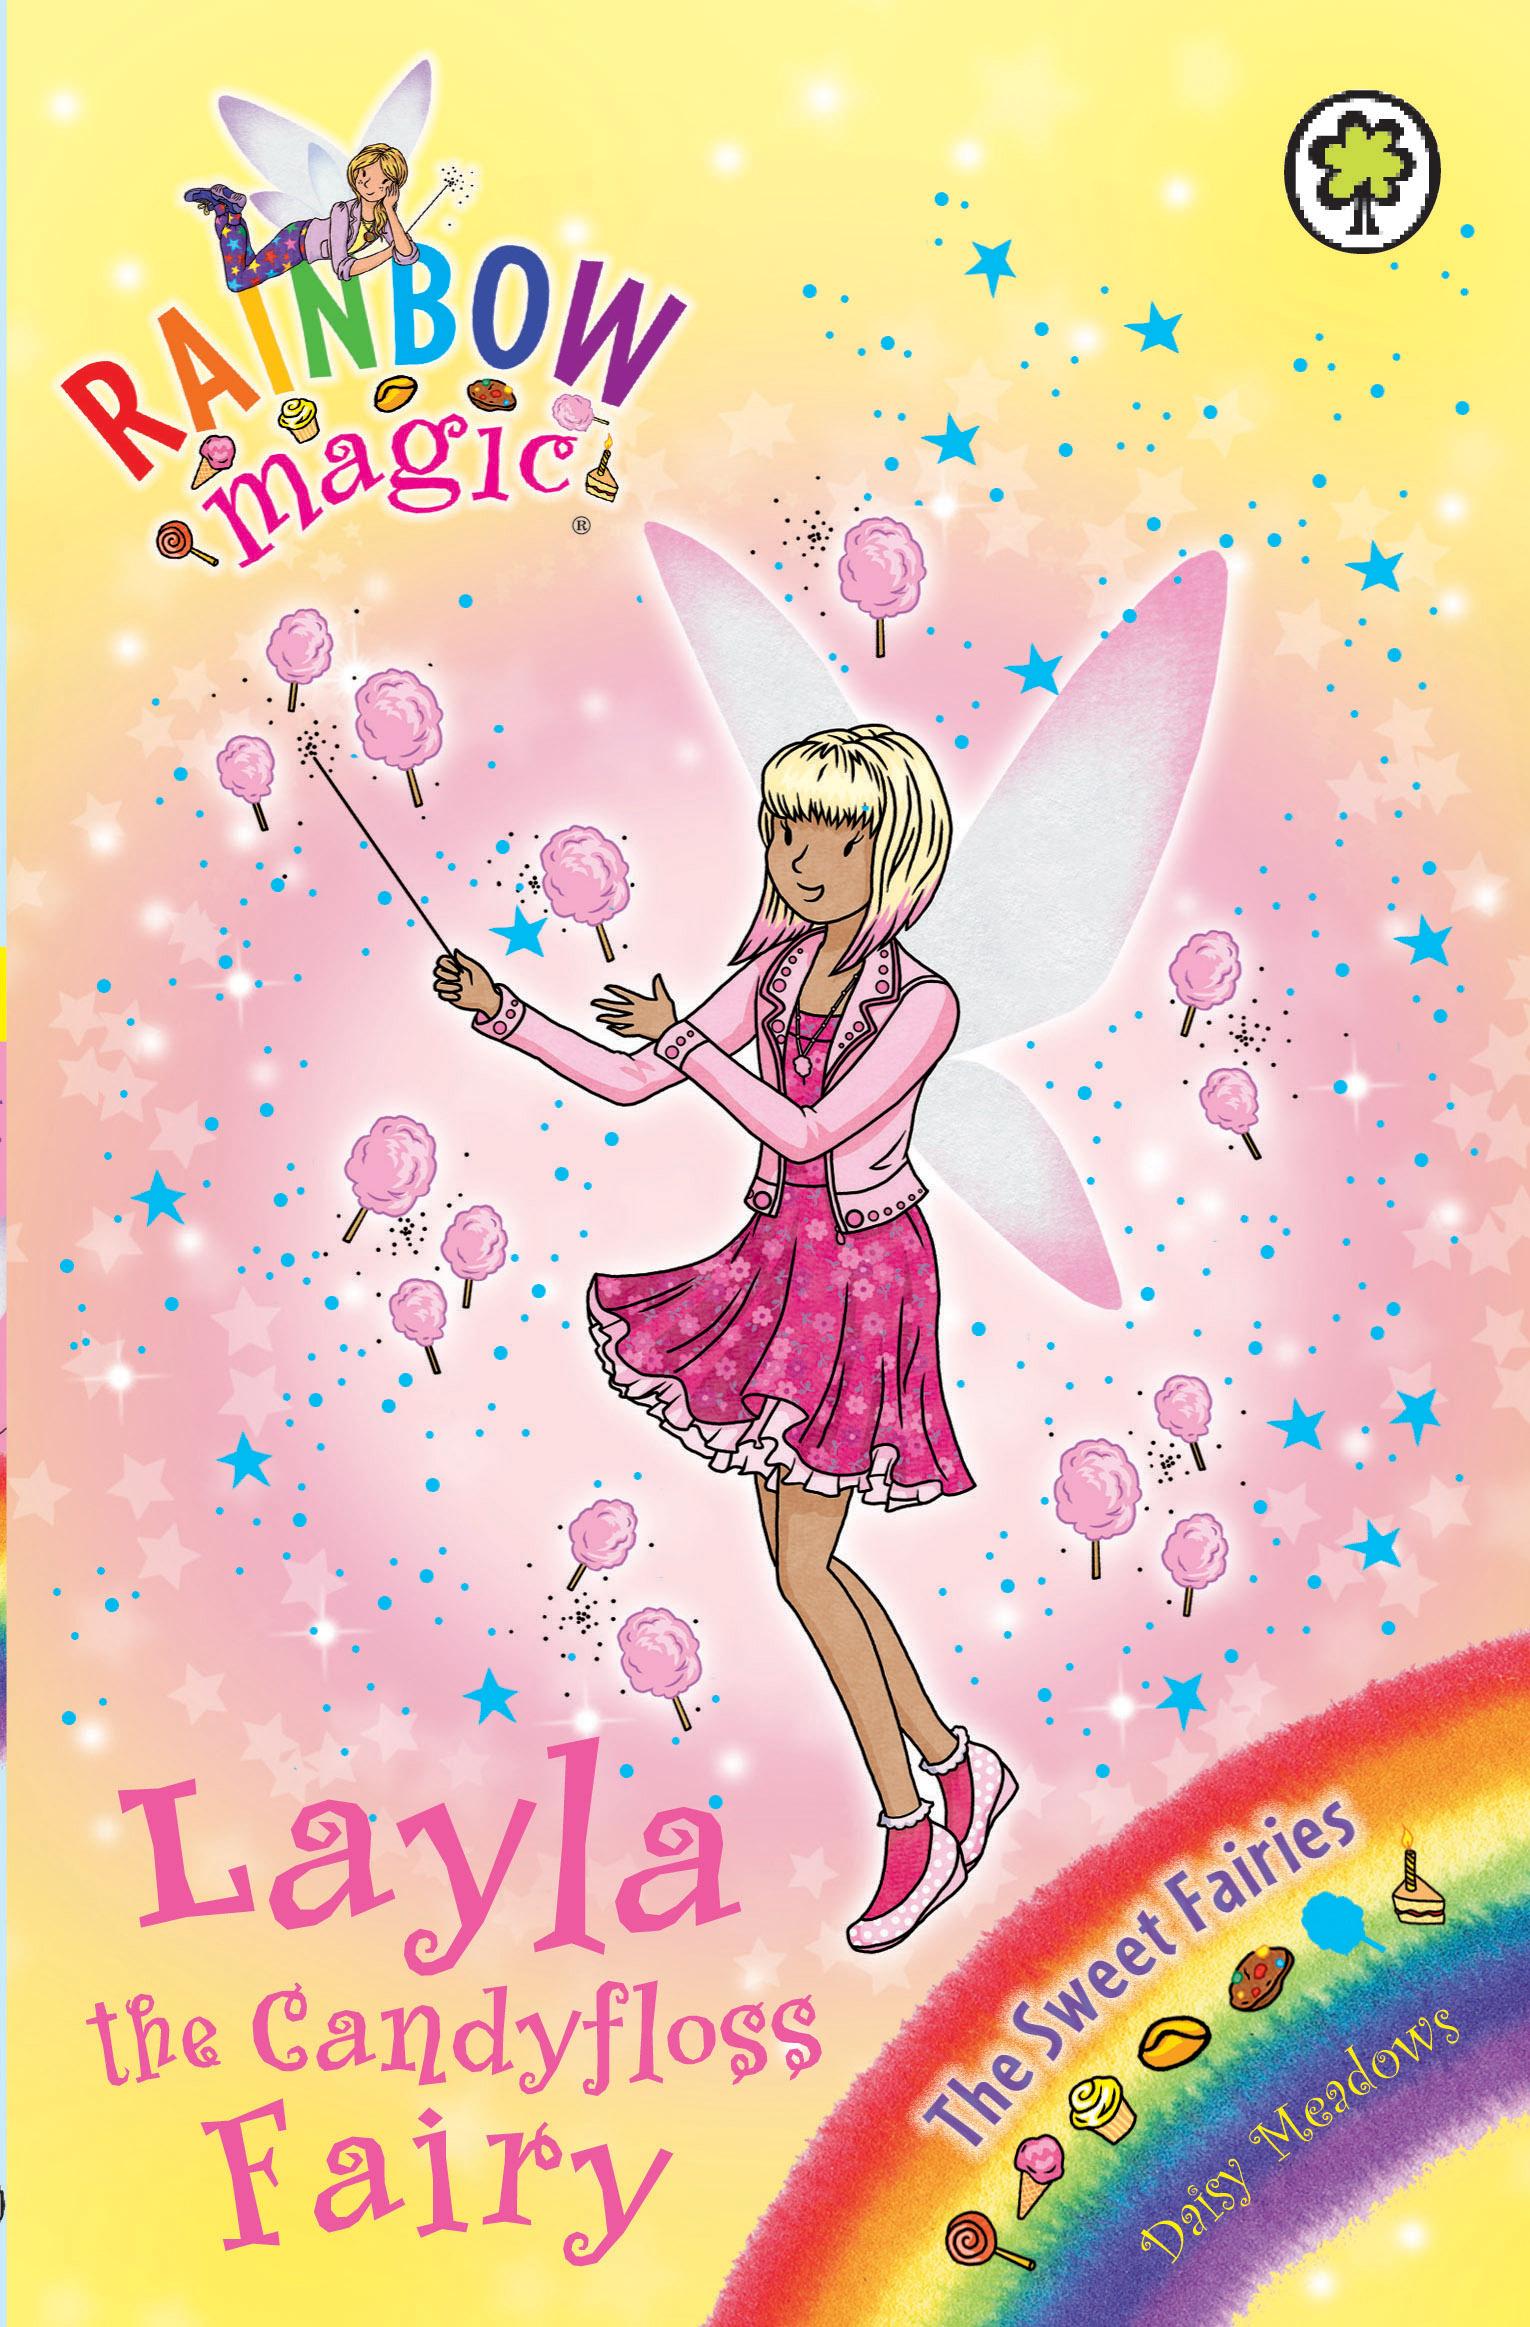 File:Layla the Candyfloss Fairy.jpg